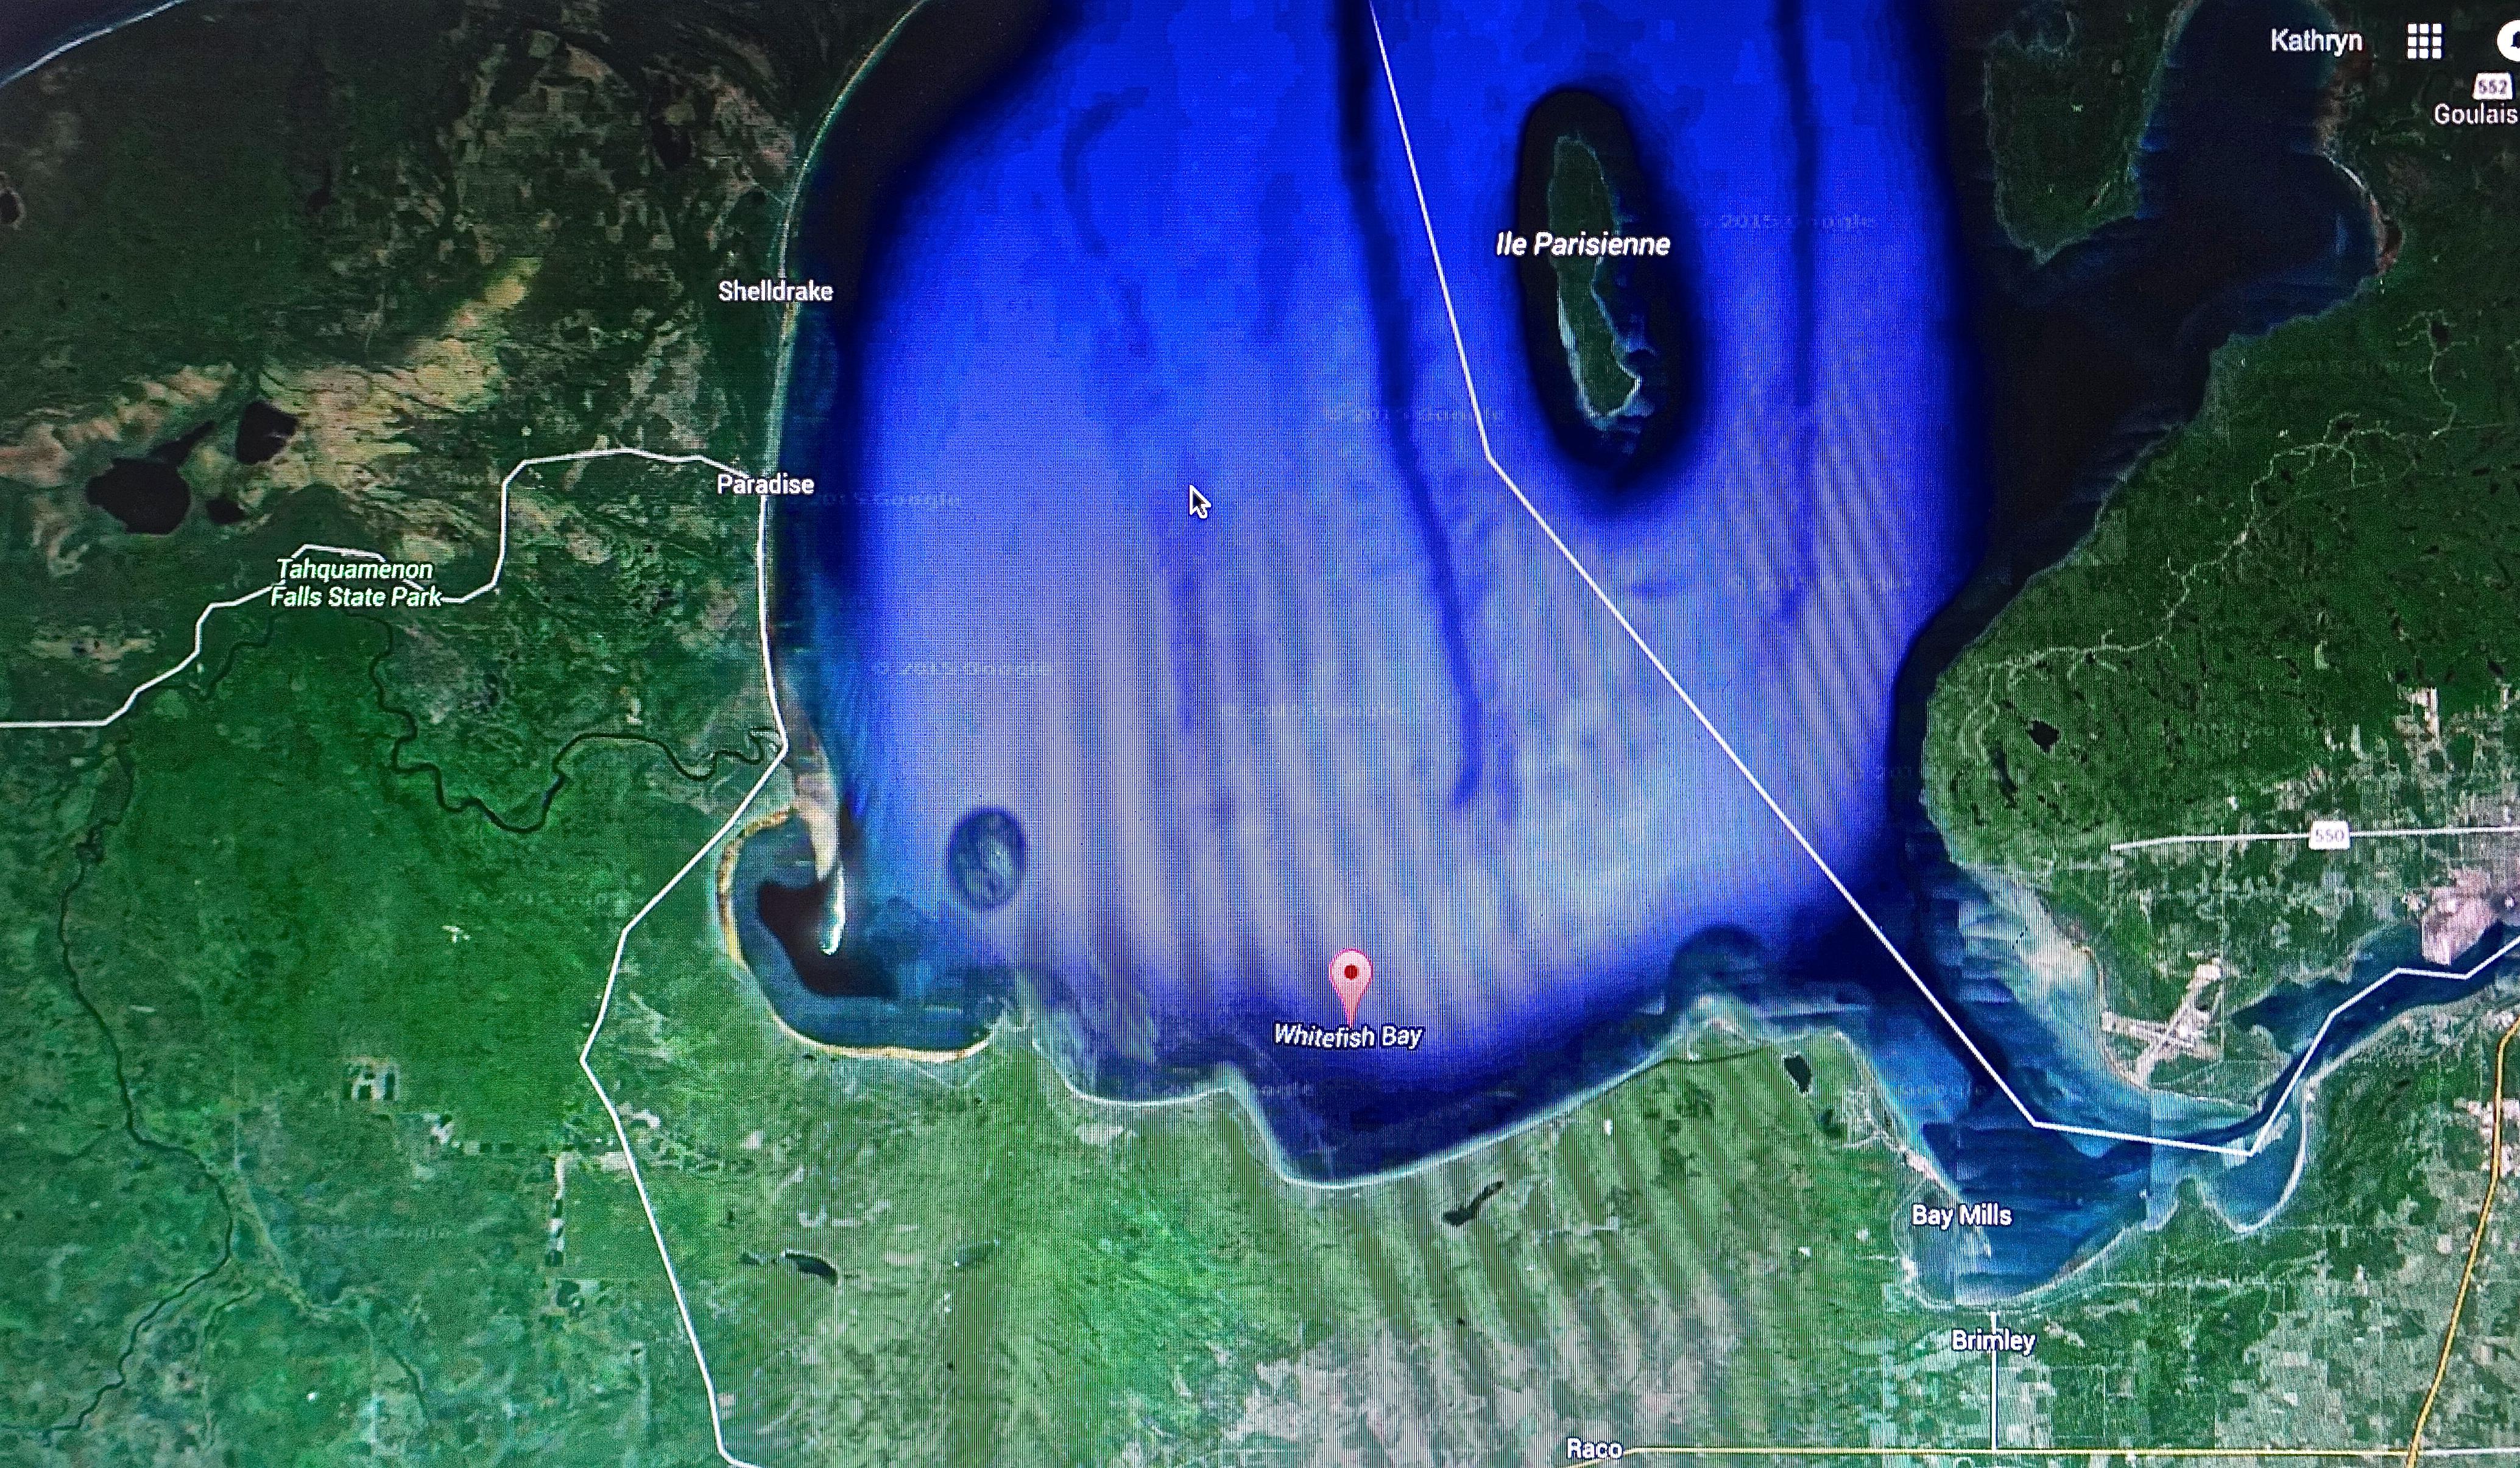 Whitefish Bay, Google Maps